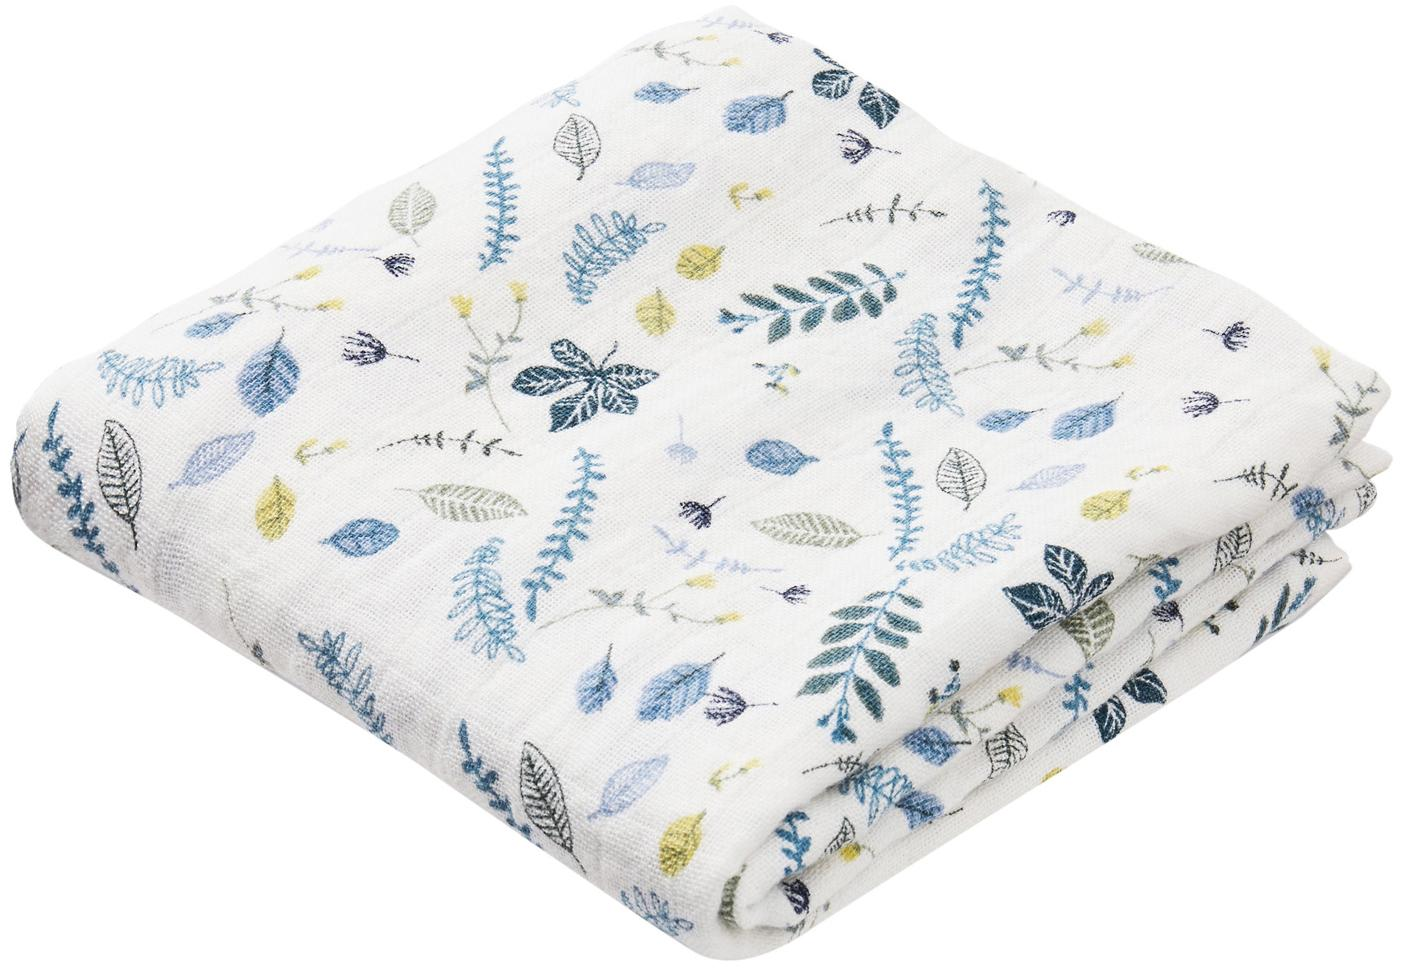 Pañales de tela Pressed Leaves, 2uds., Algodón orgánico, Blanco, azul, gris, amarillo, An 70 x L 70 cm